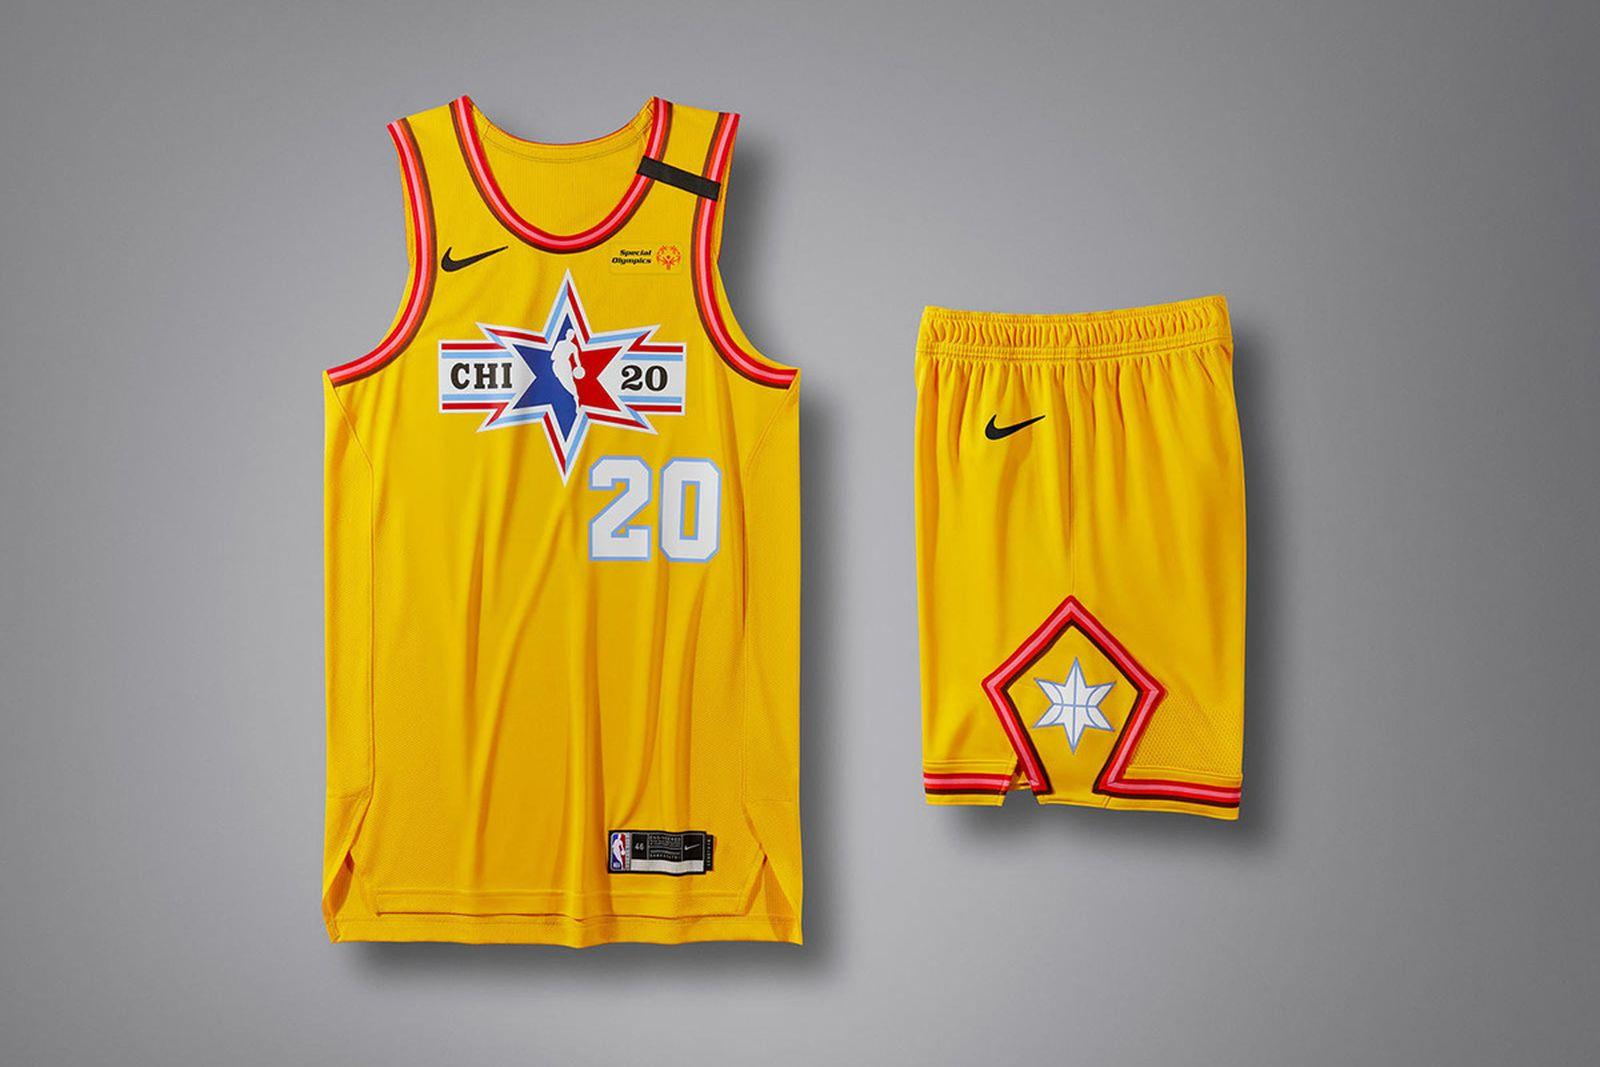 jordan-brand-nba-star-game-uniforms-03